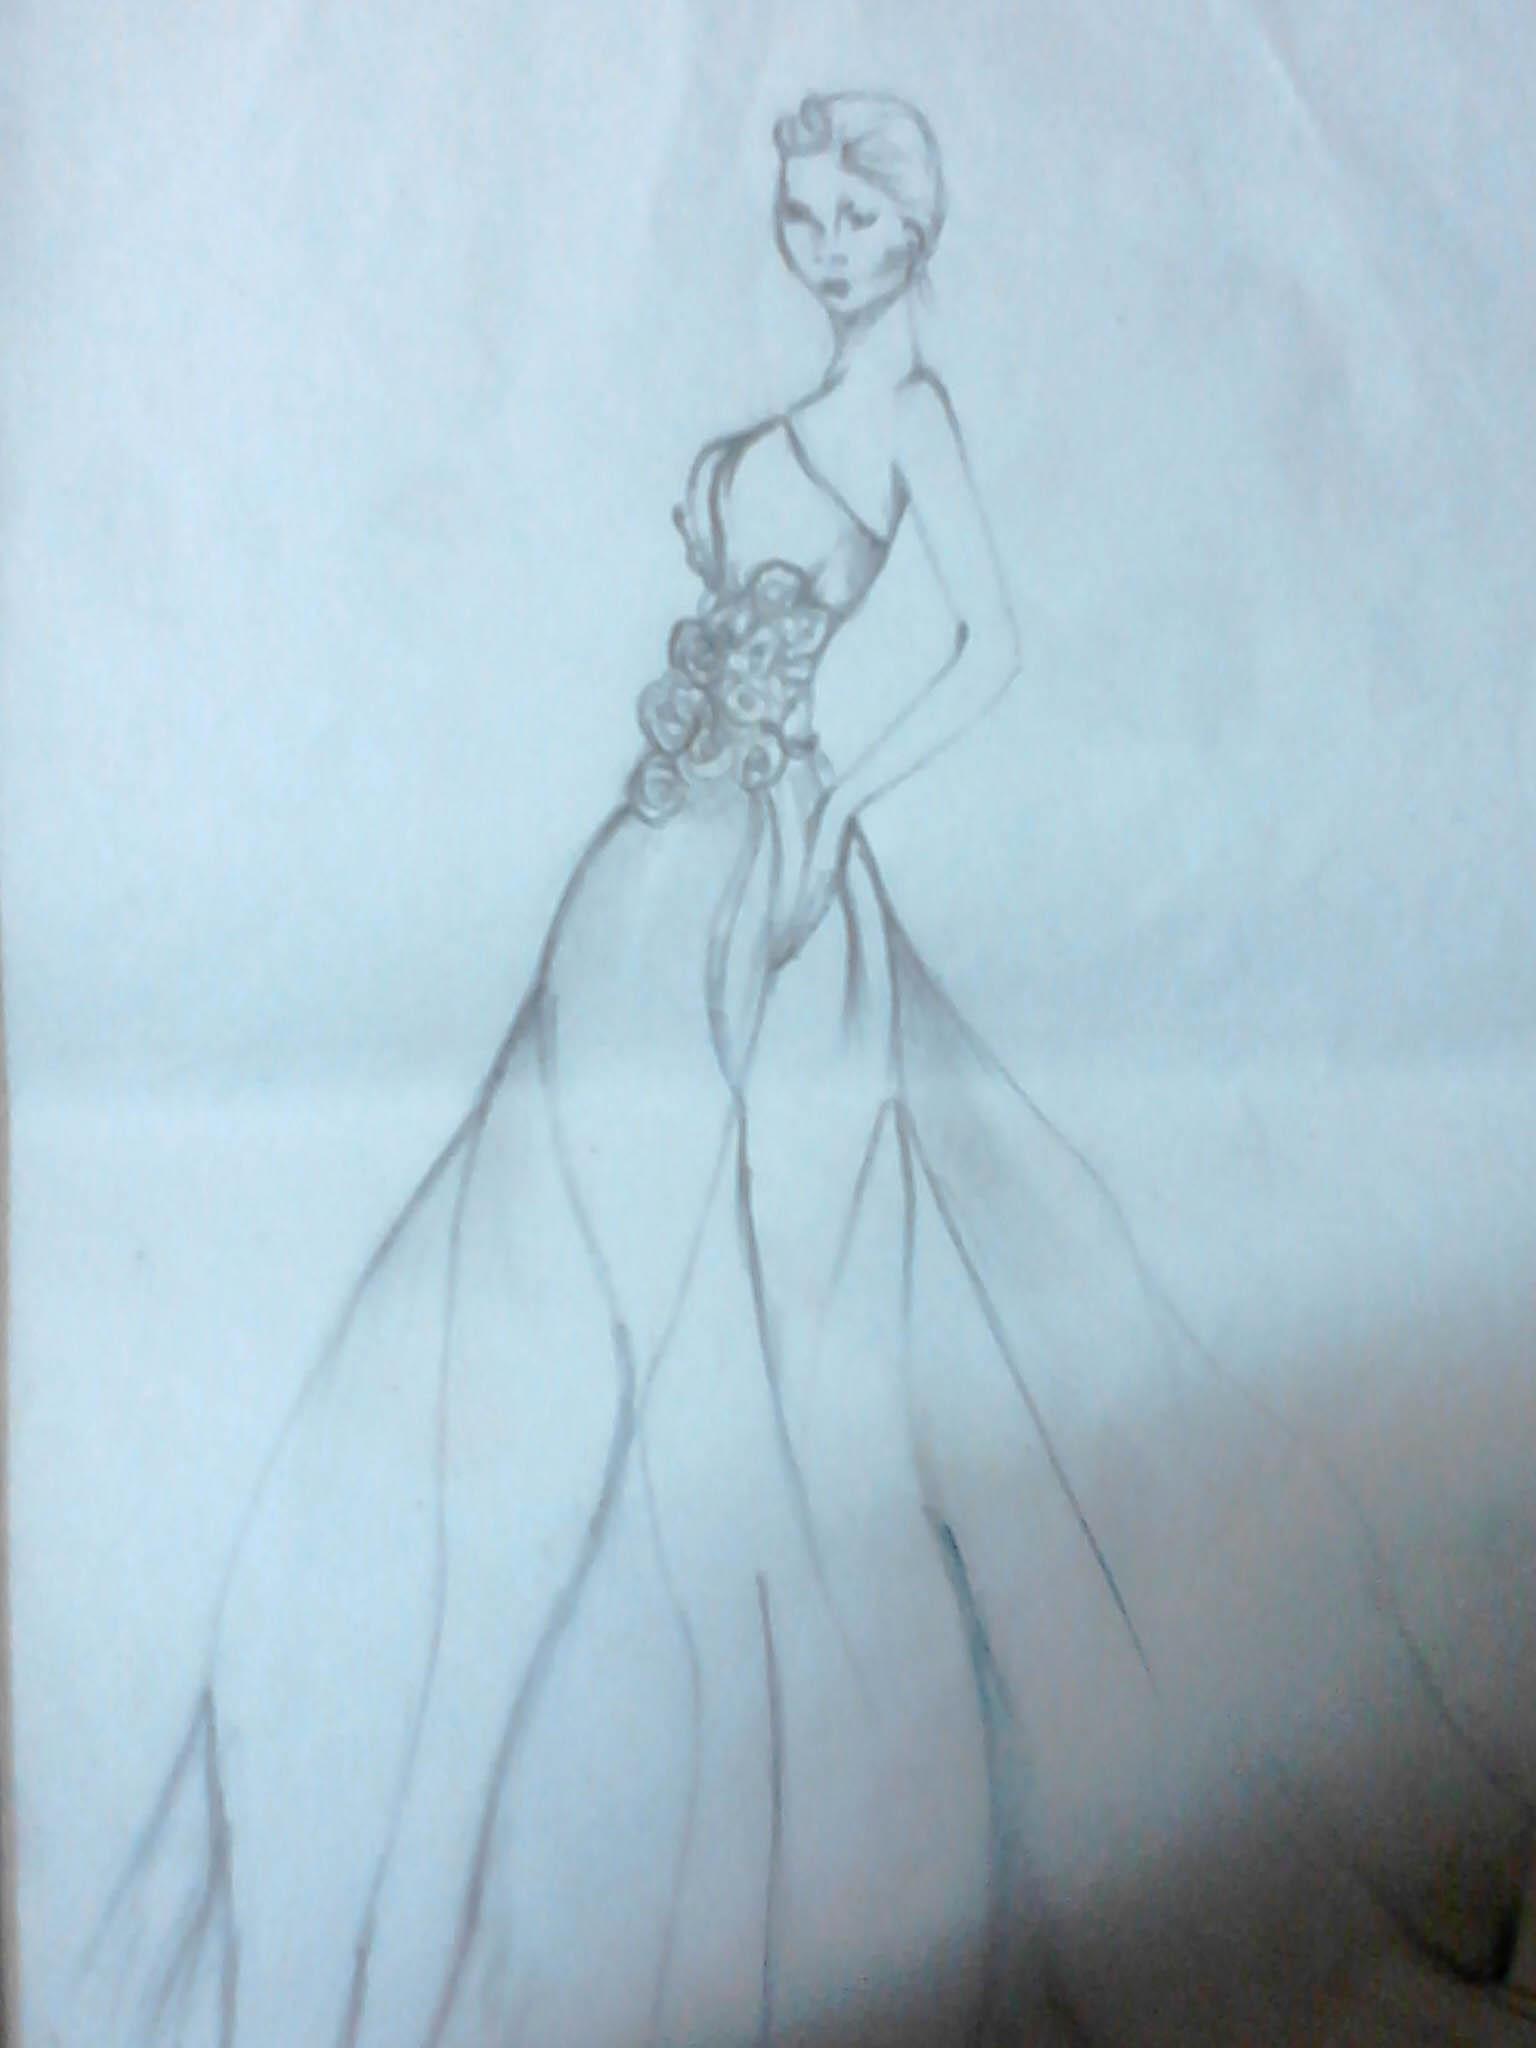 735dcf401 تصميم ازياء. 16.jpg. رسم فستان بالقلم الرصاص